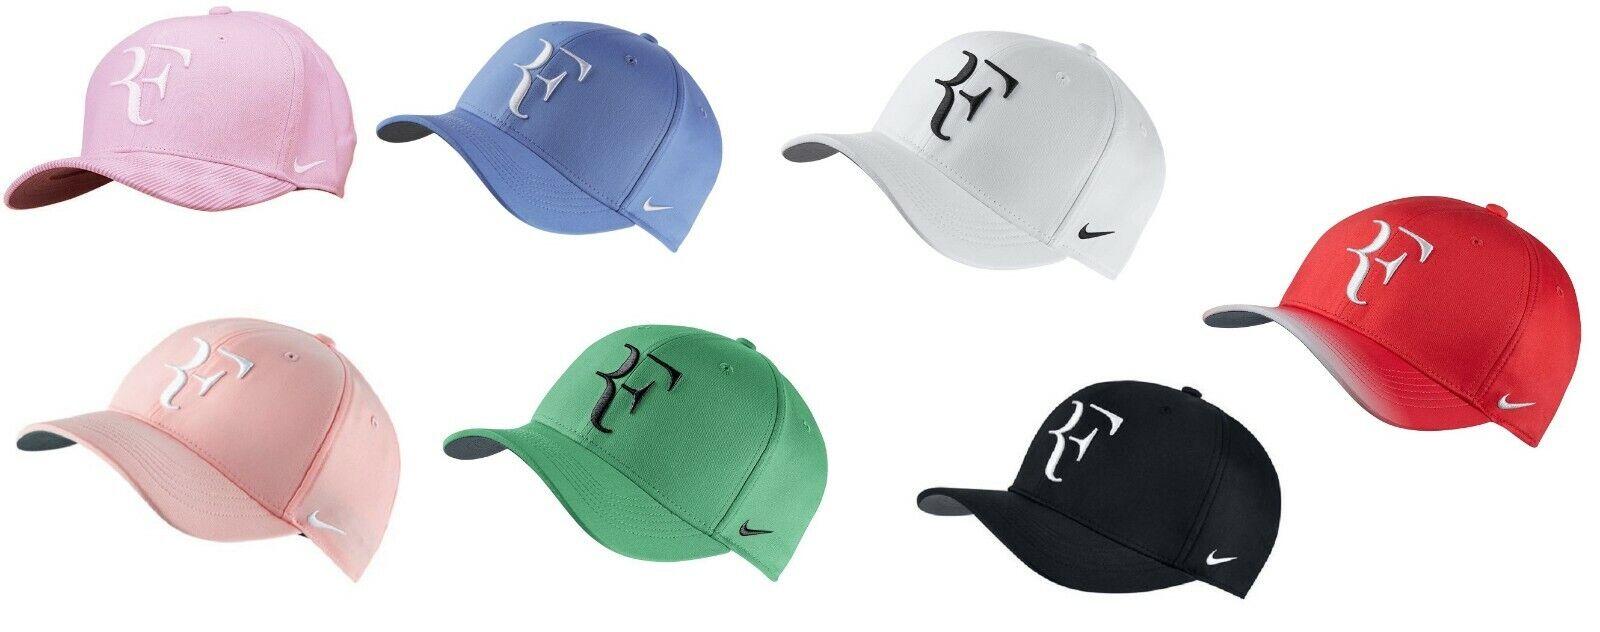 e1e7c28cec3 NIKE AEROBILL CLC99 RF TENNIS HAT 868579 COURT nnxeyk1034-Hats ...